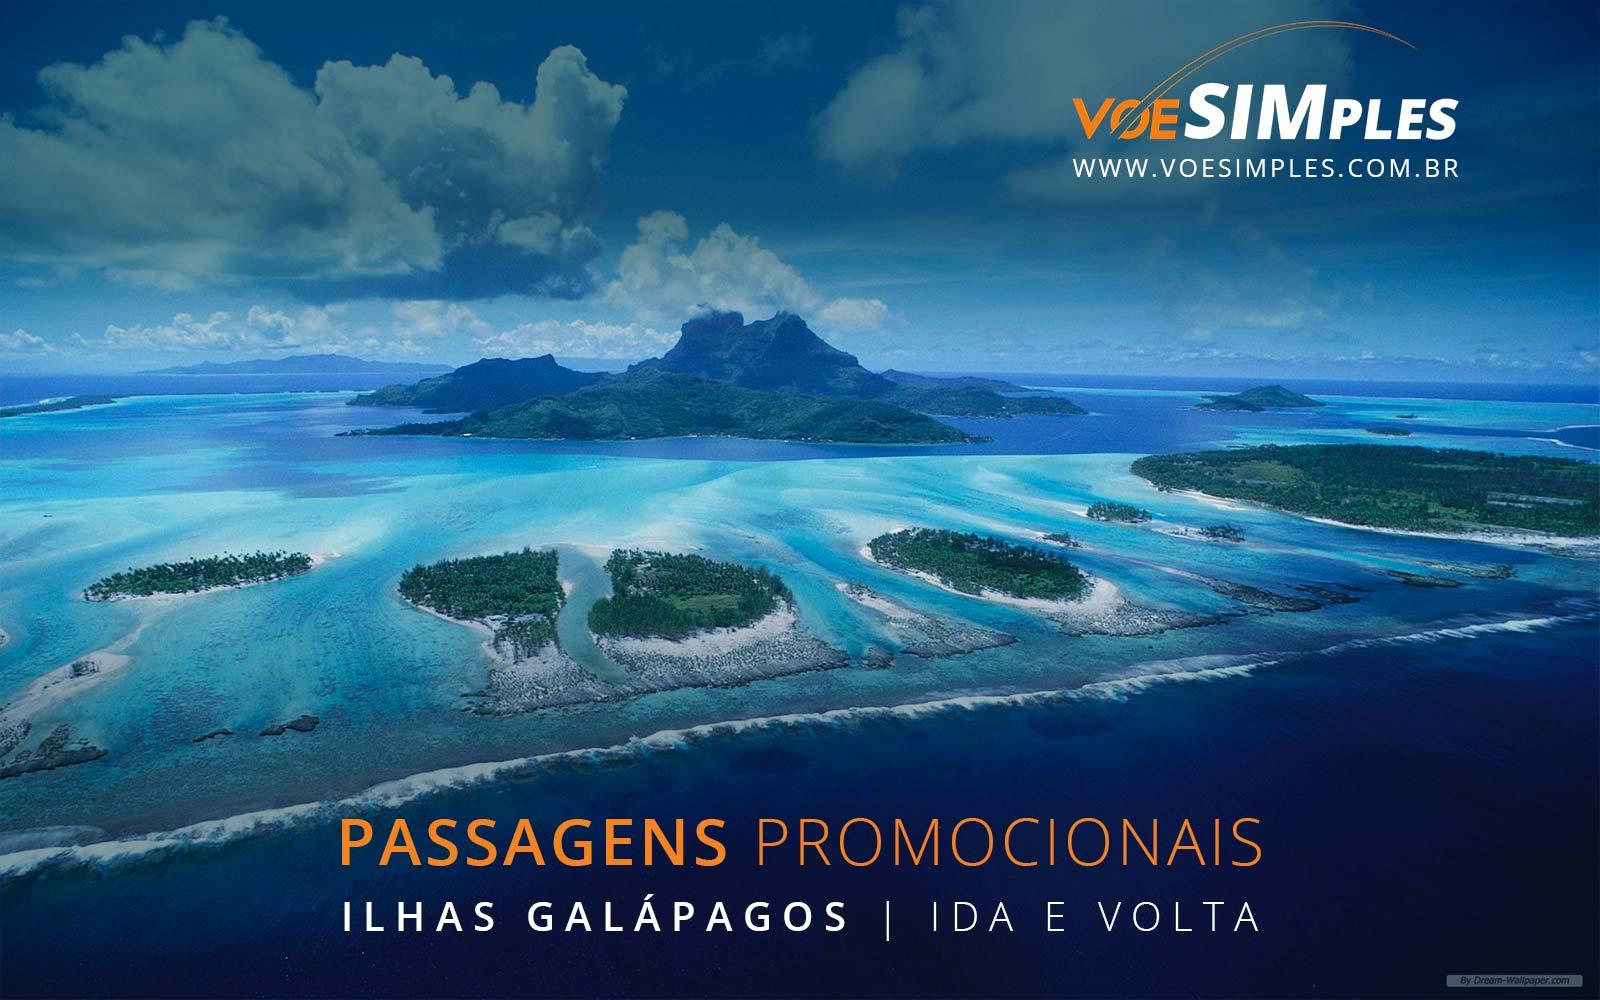 Passagens aéreas promocionais para as Ilhas Galápagos